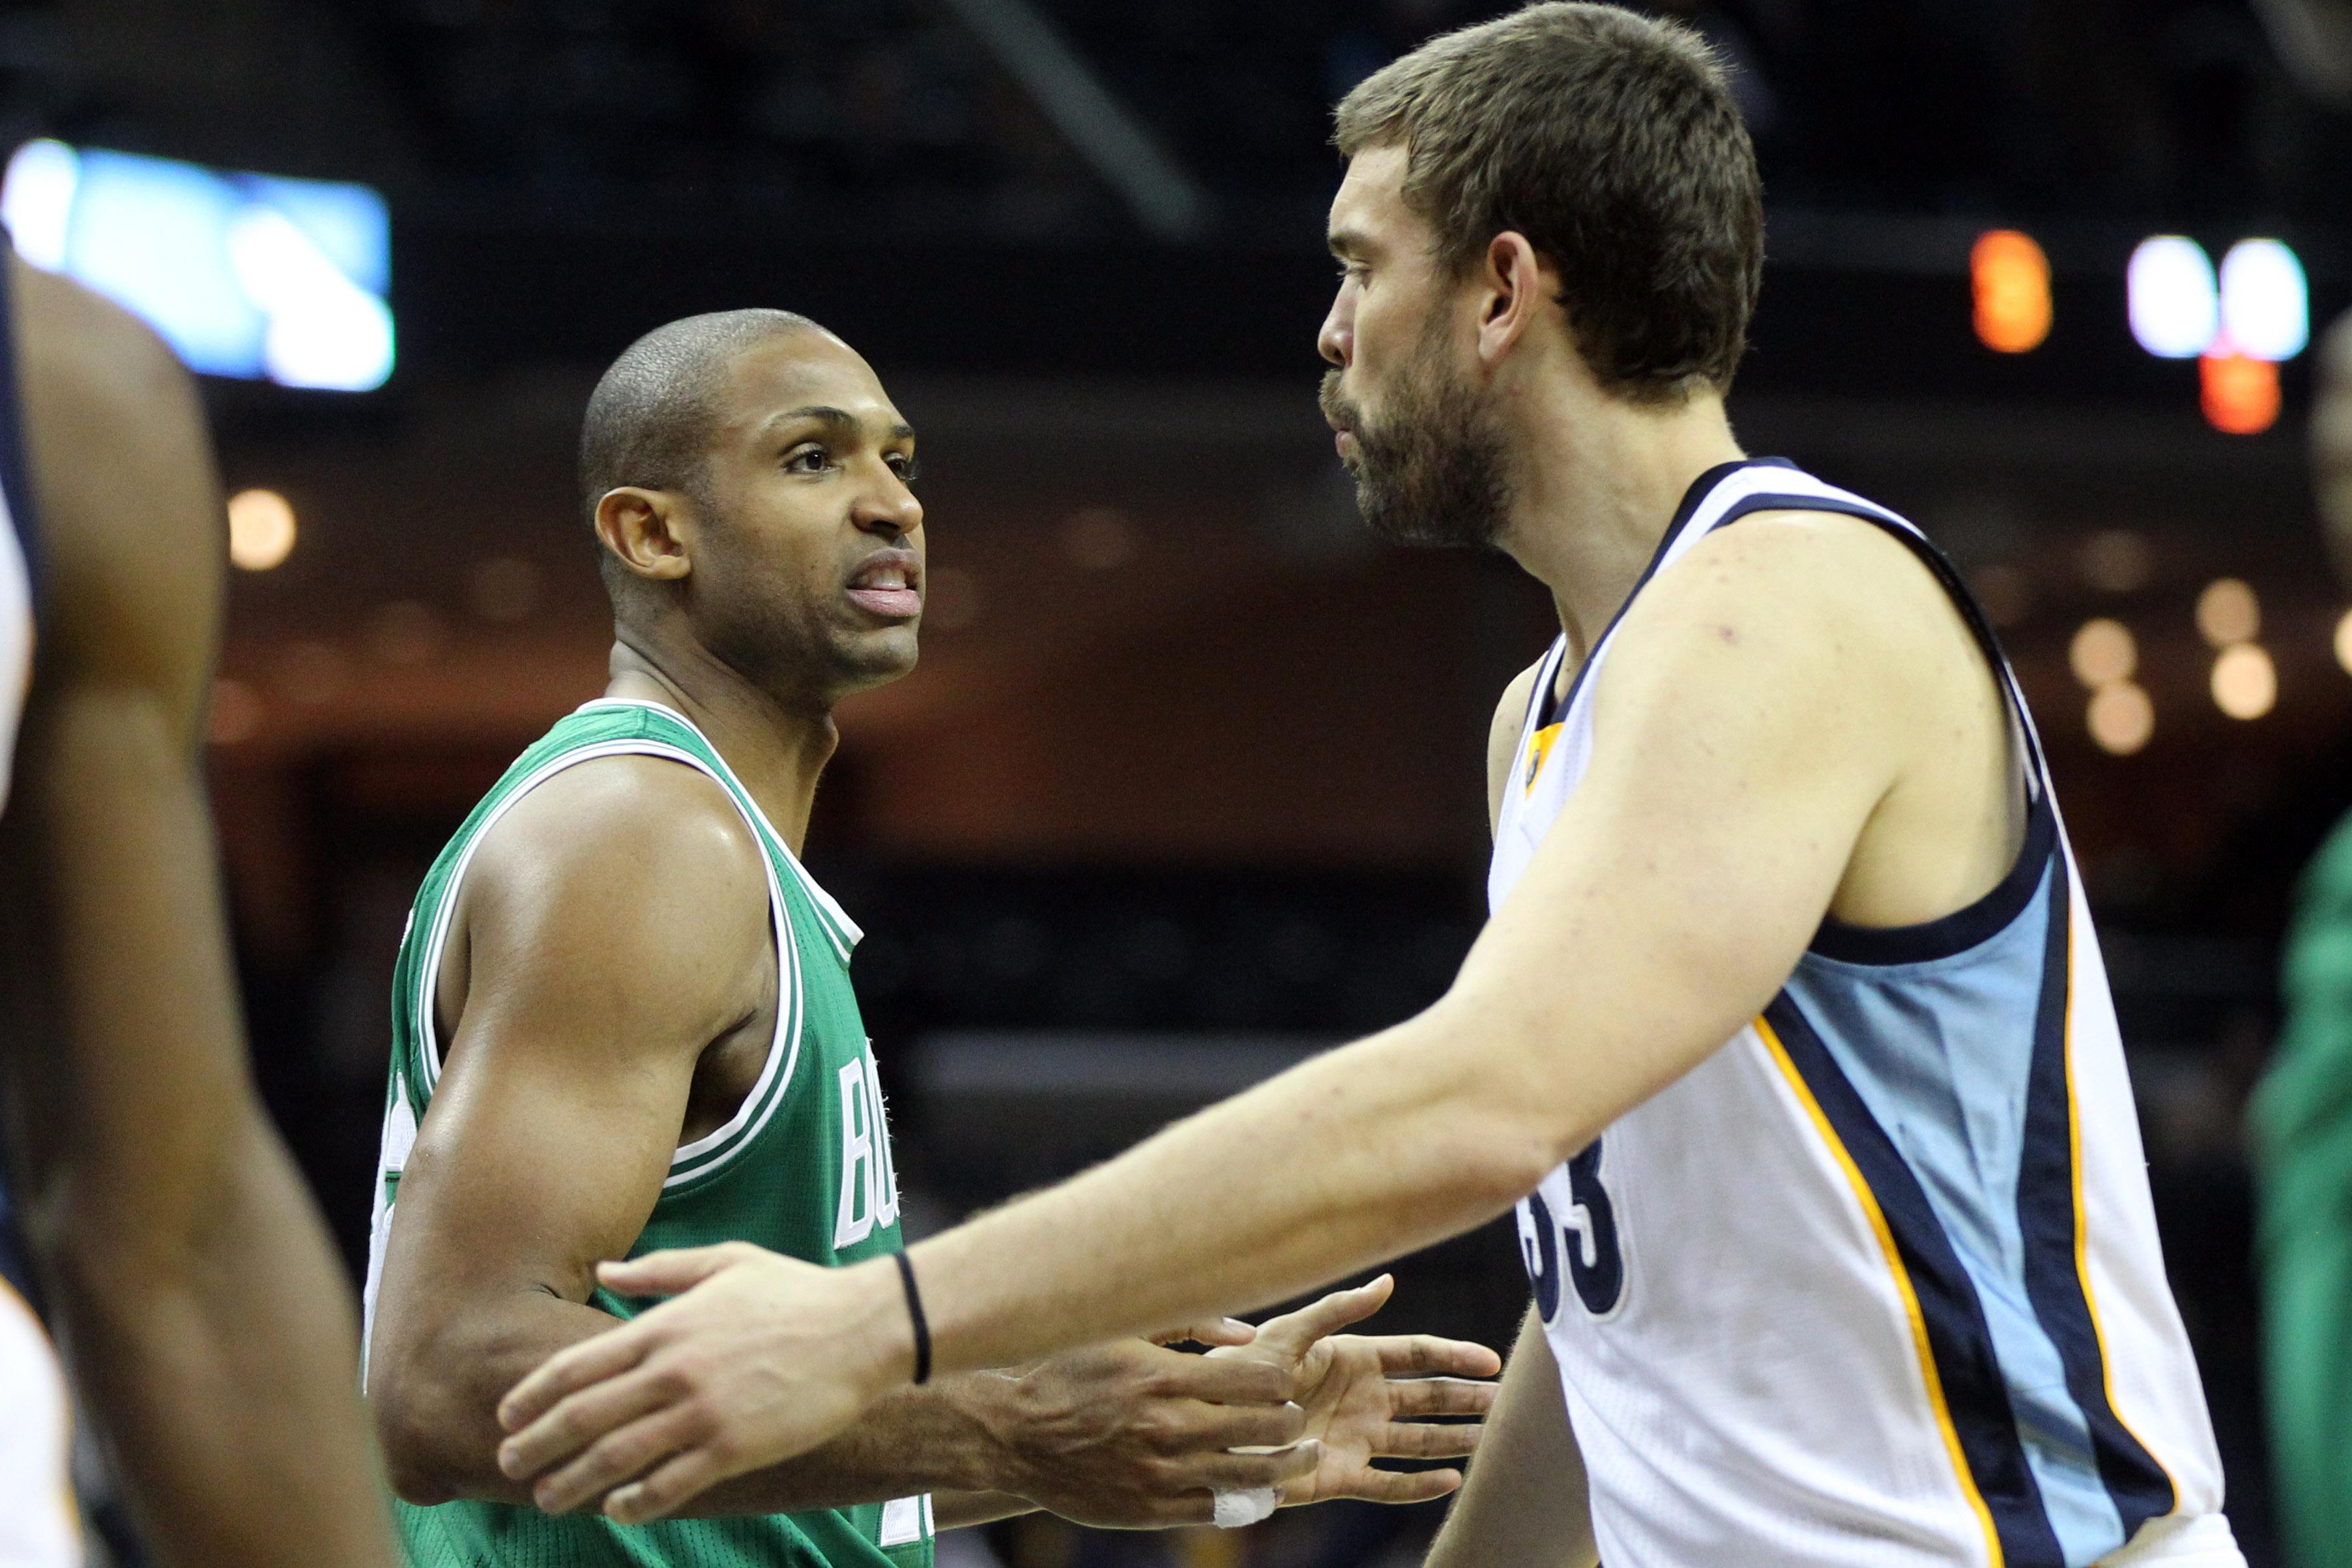 NBA: Boston Celtics at Memphis Grizzlies